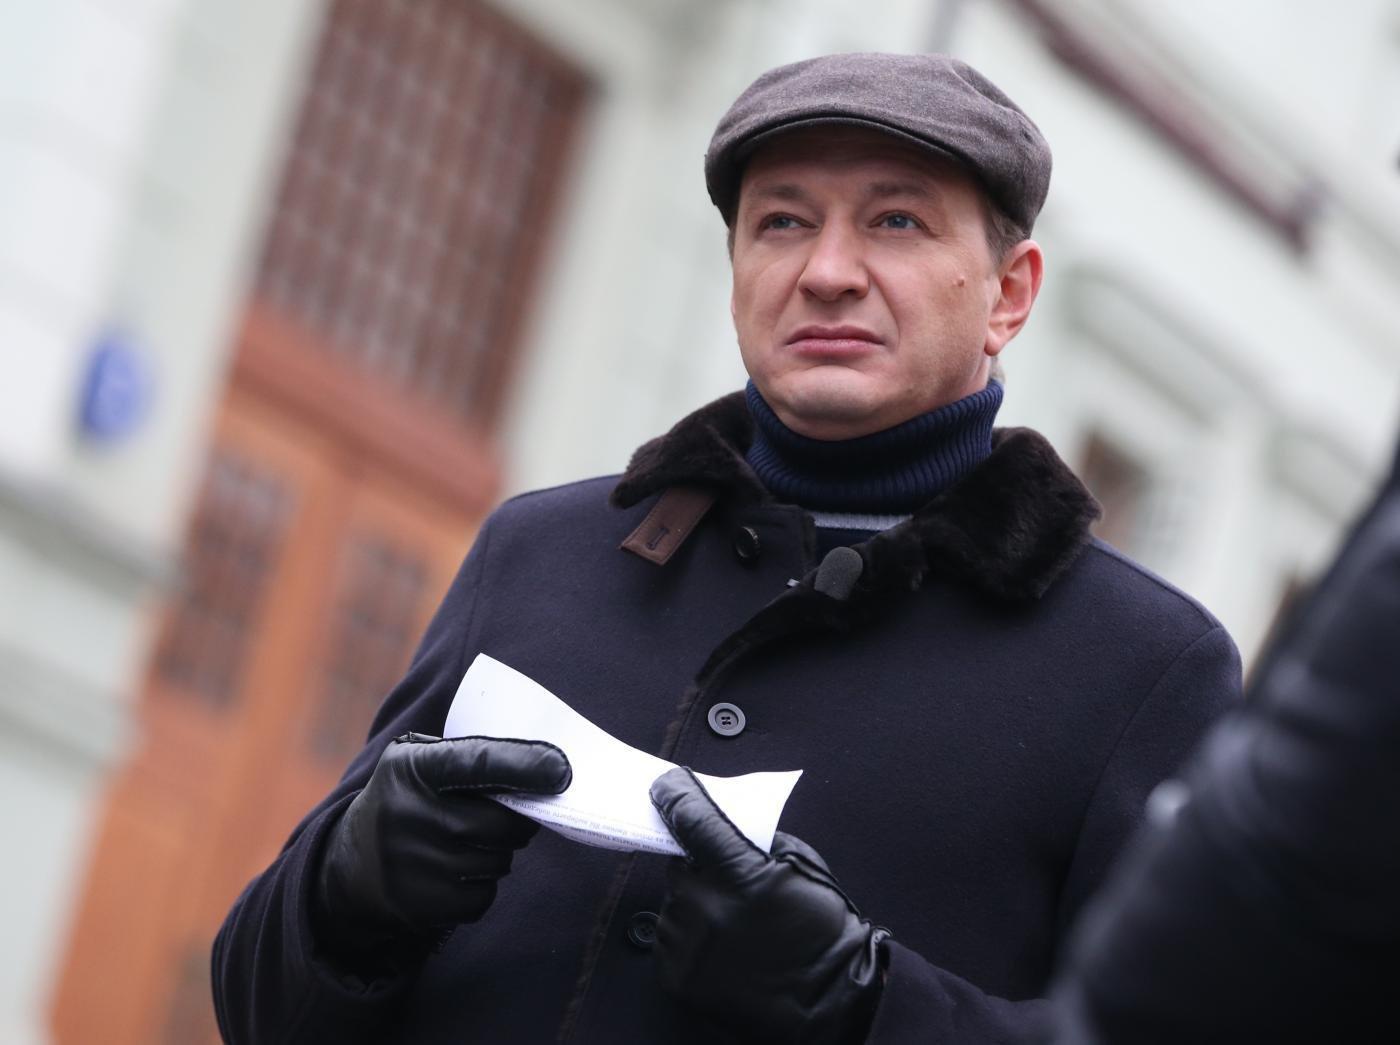 Размещен трейлер ленты «Мулла» сМаратом Башаровым